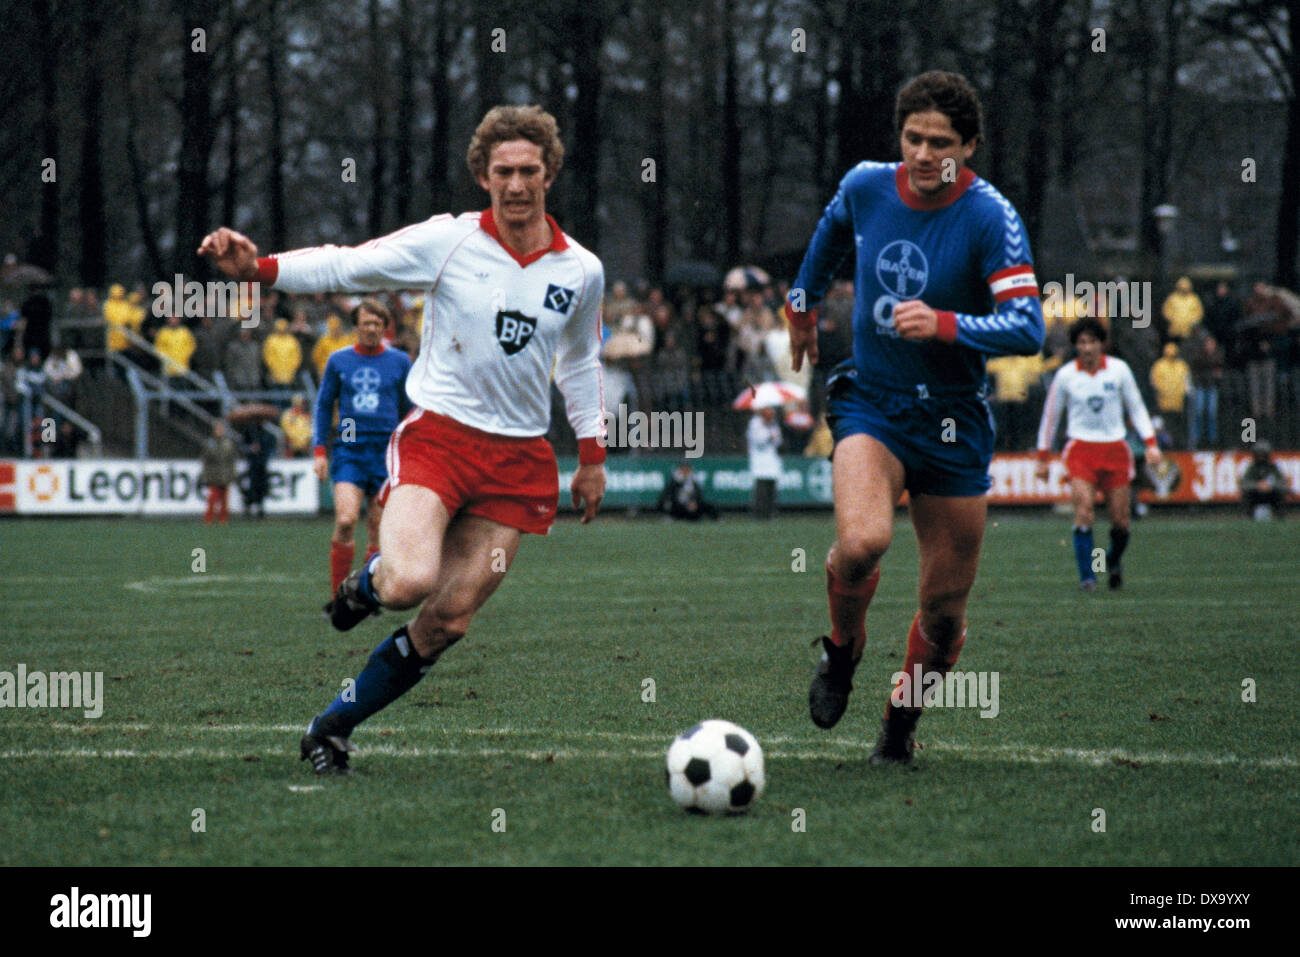 football, Bundesliga, 1980/1981, Grotenburg Stadium, FC Bayer 05 Uerdingen versus Hamburger SV 0:3, scene of the match, Dietmar Jakobs (HSV) left and team leader Paul Hahn (Bayer) - Stock Image